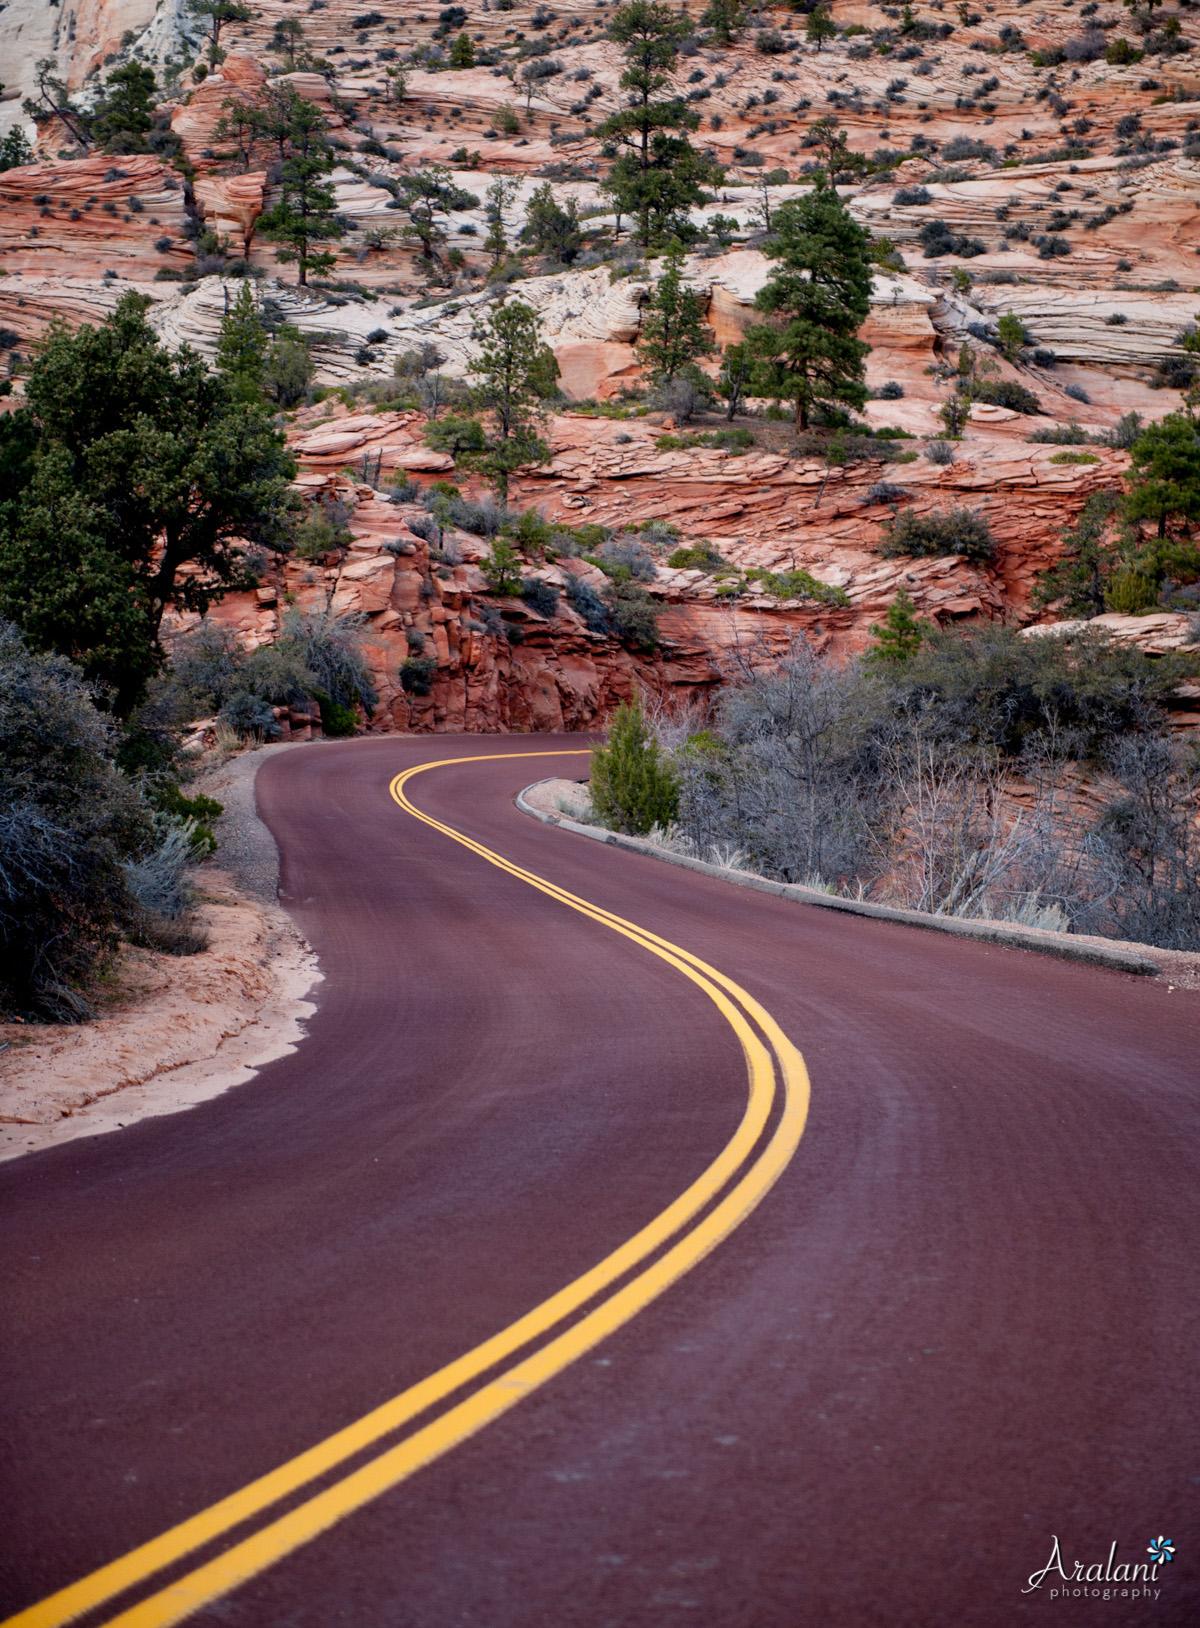 Zion_Canyoneering_Adventure036.jpg